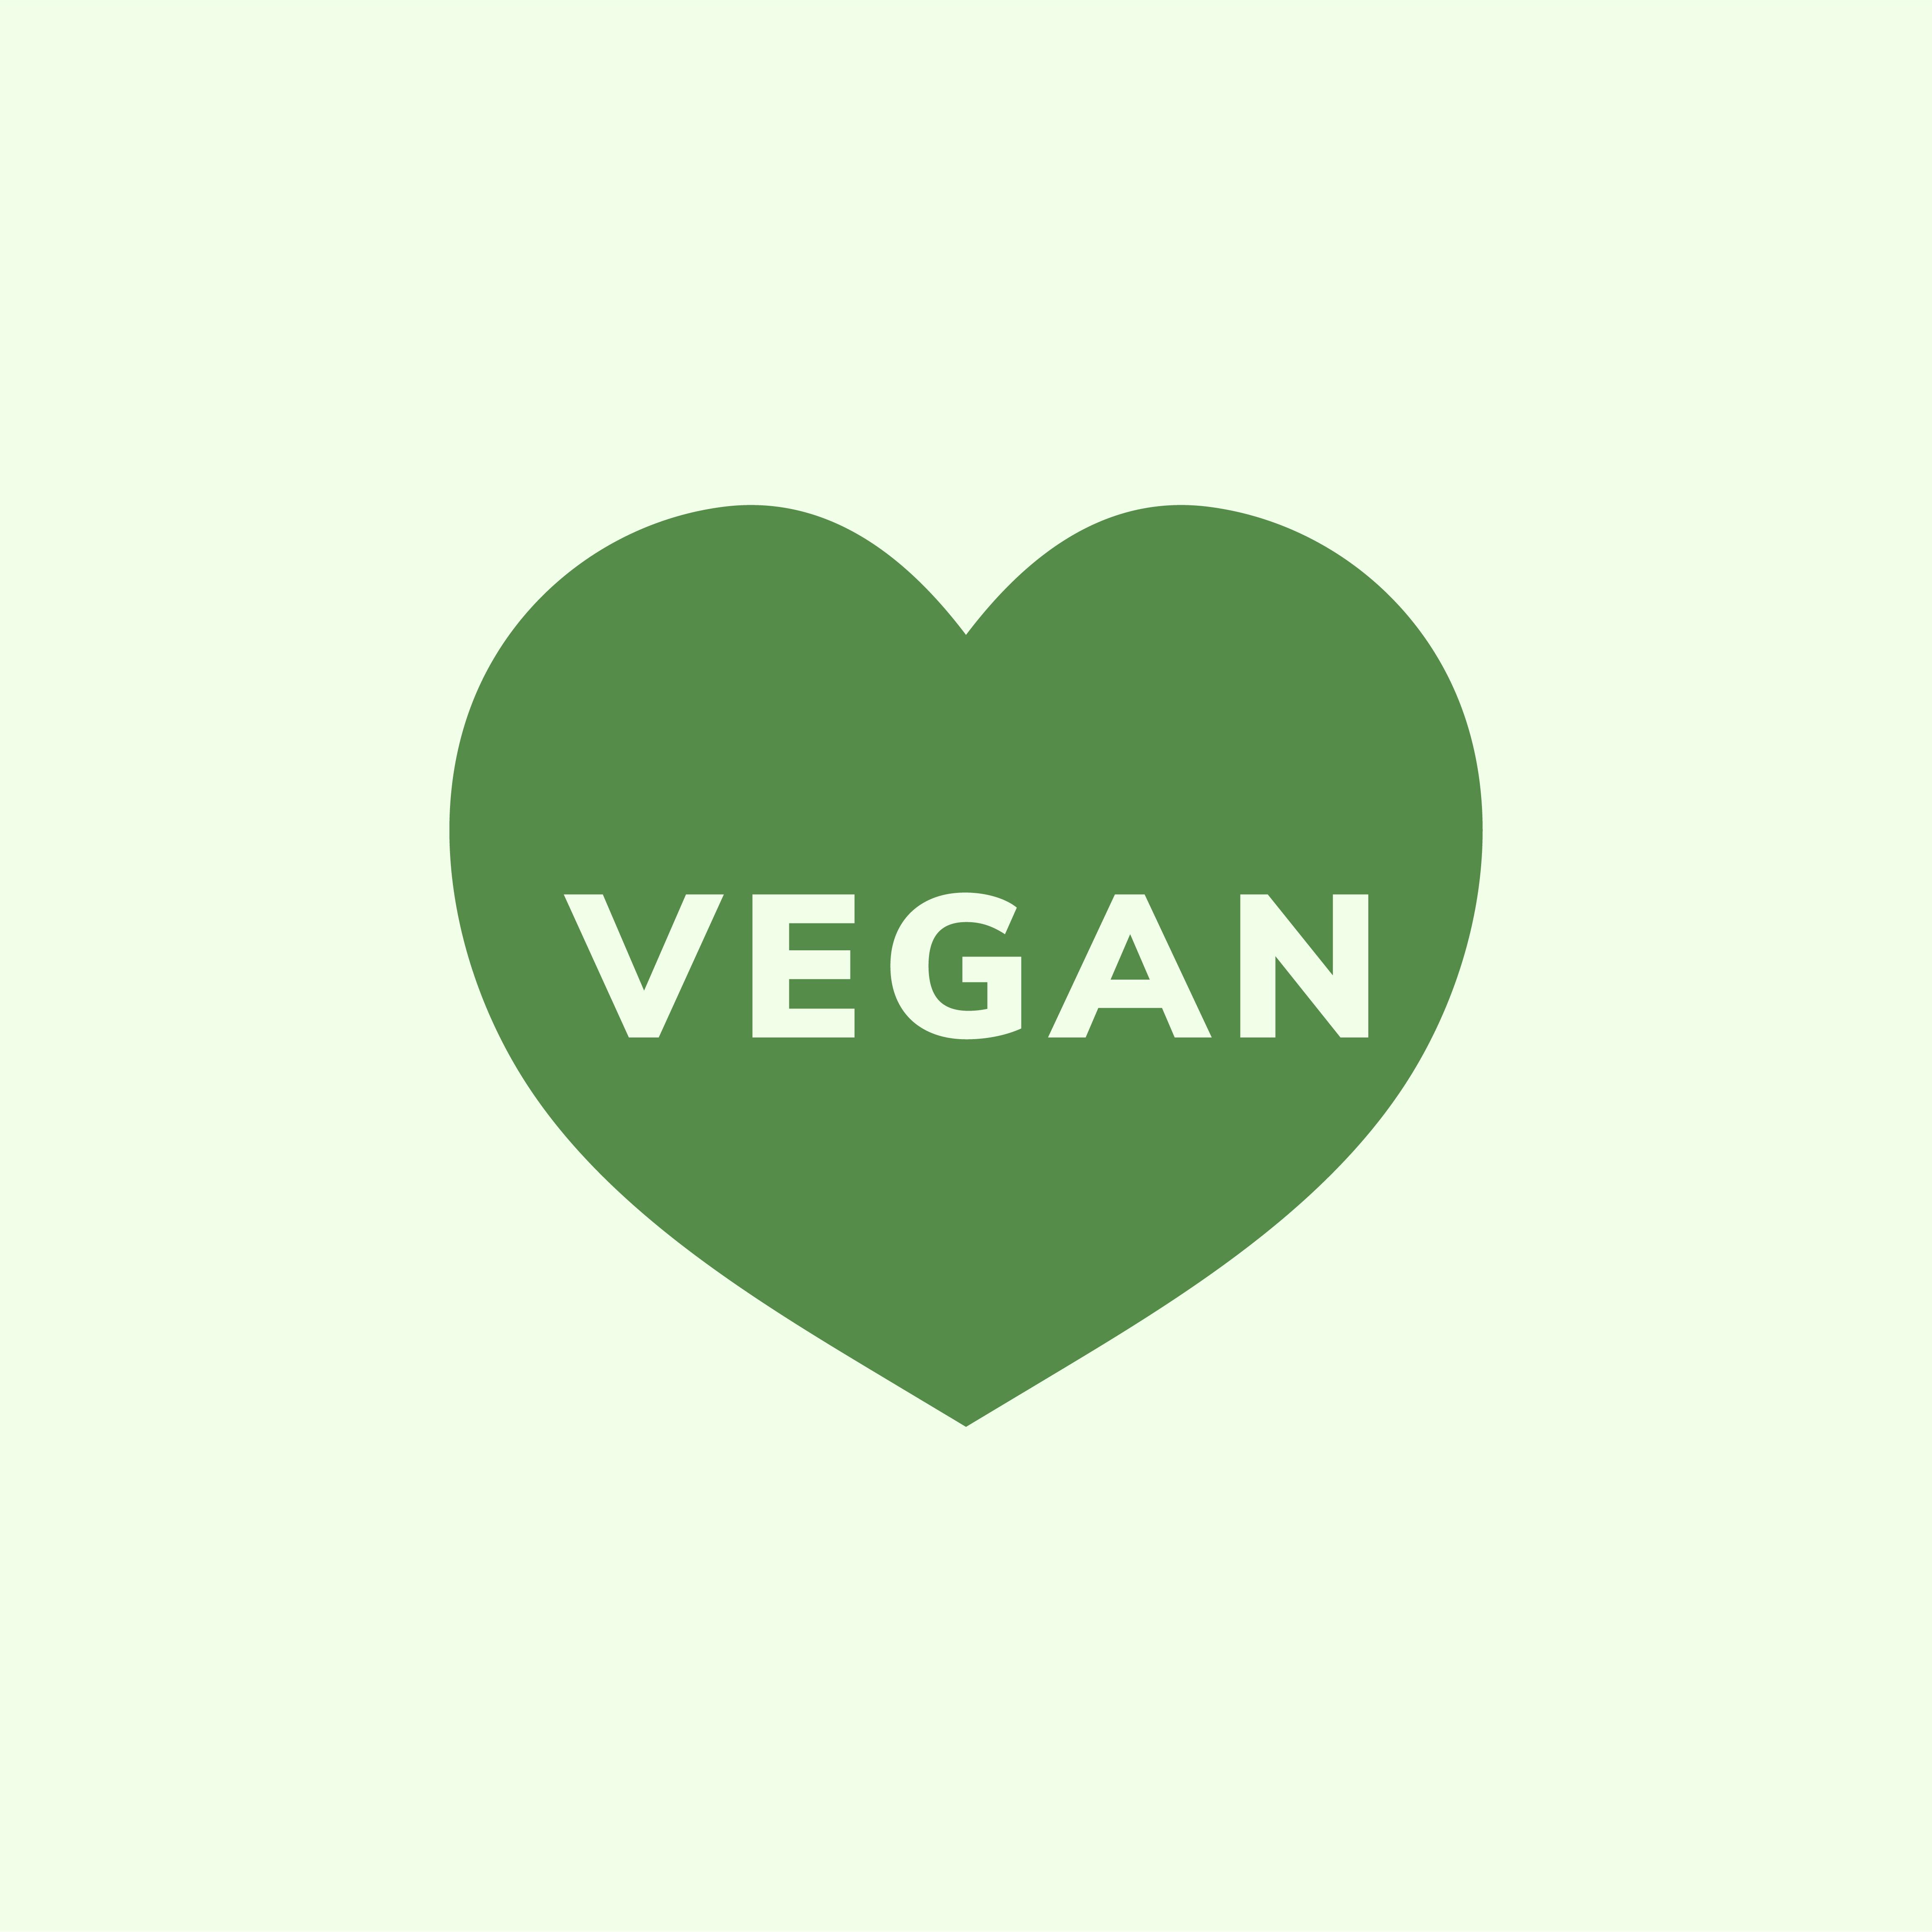 The Word Vegan In A Heart Shape Vector